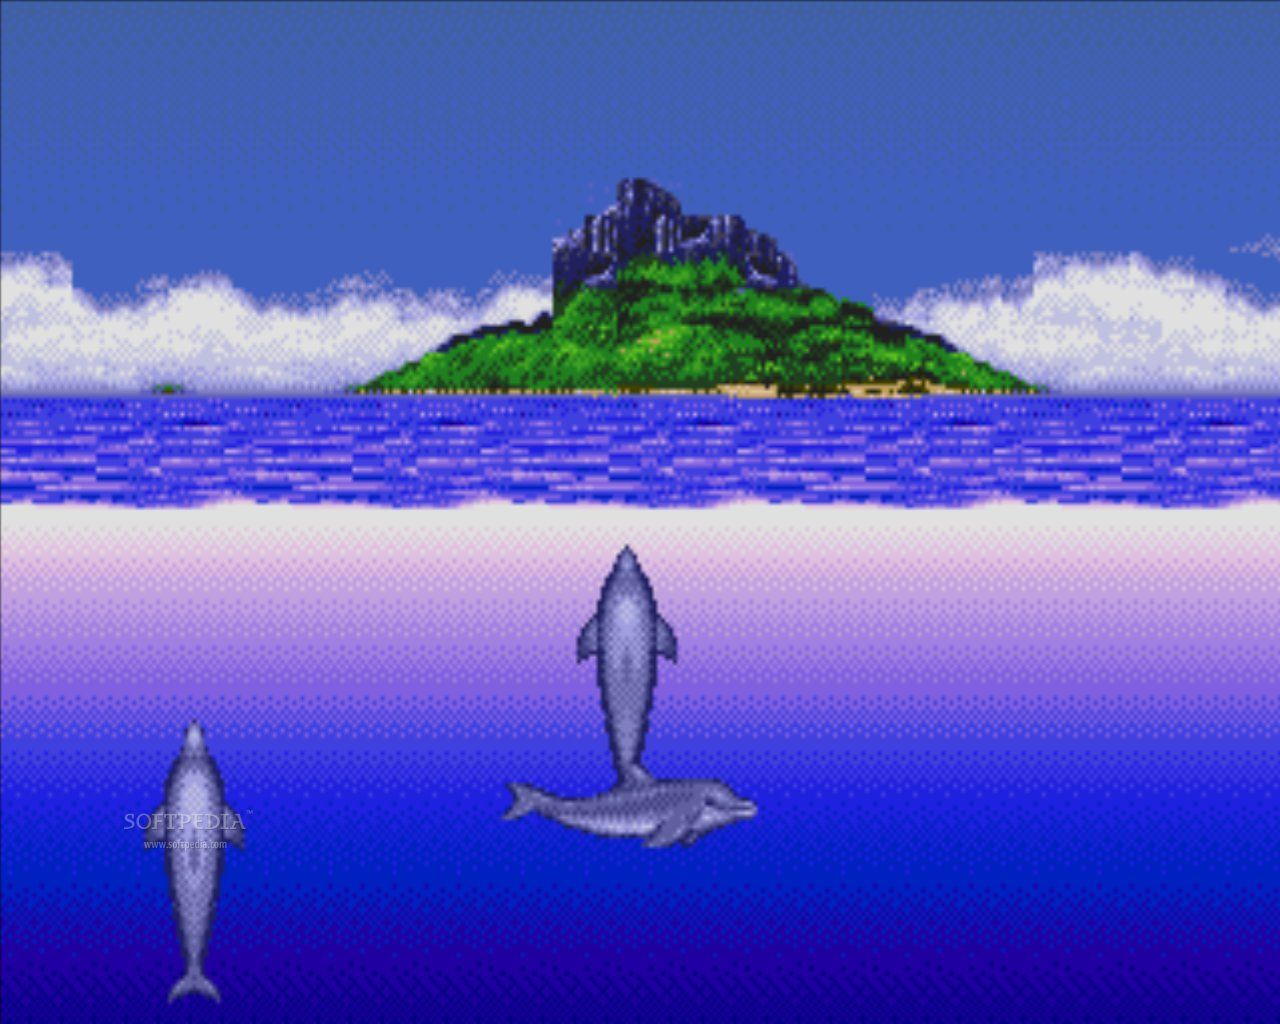 Sega_Classic_Diary_2_Ecco_the_Dolphin_05large